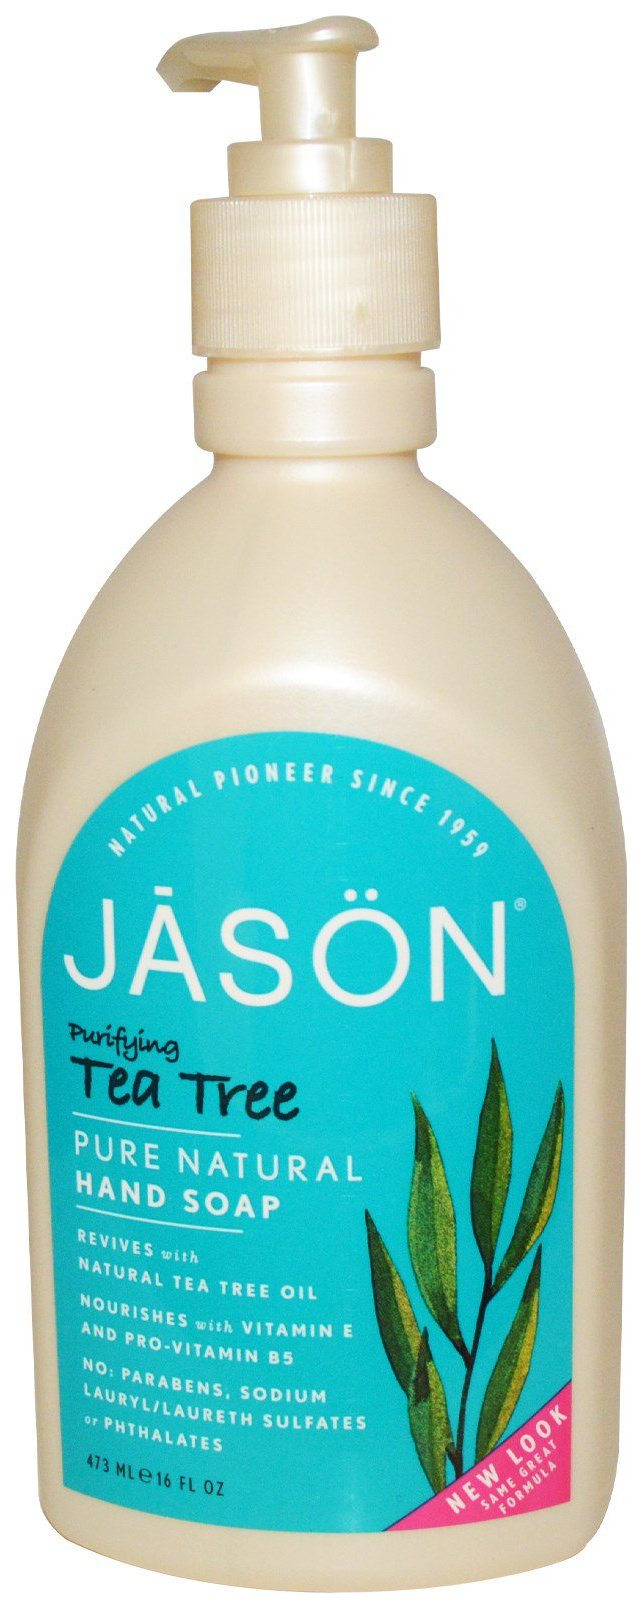 Жидкое мыло Jāsön Purifying Tea Tree Hand